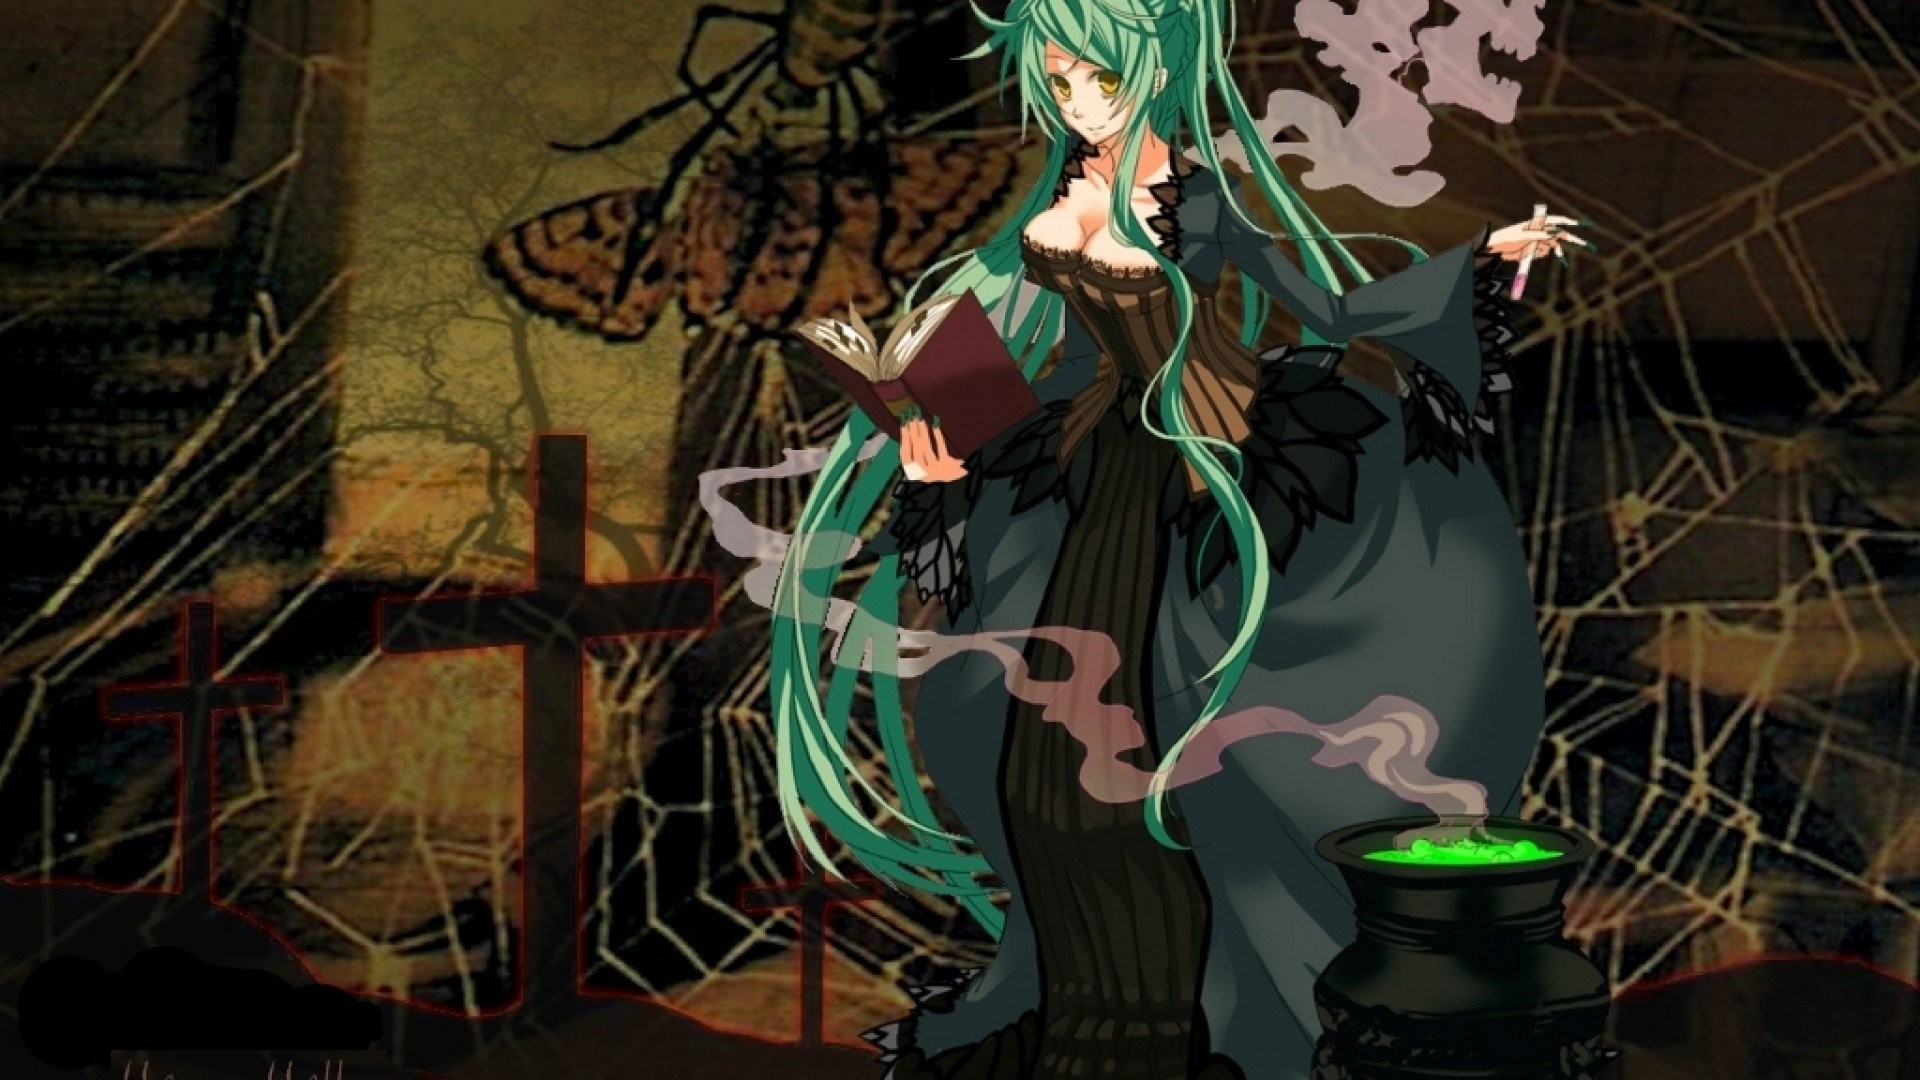 halloween wallpaper halloween witch ; wallpaper-halloween-anime